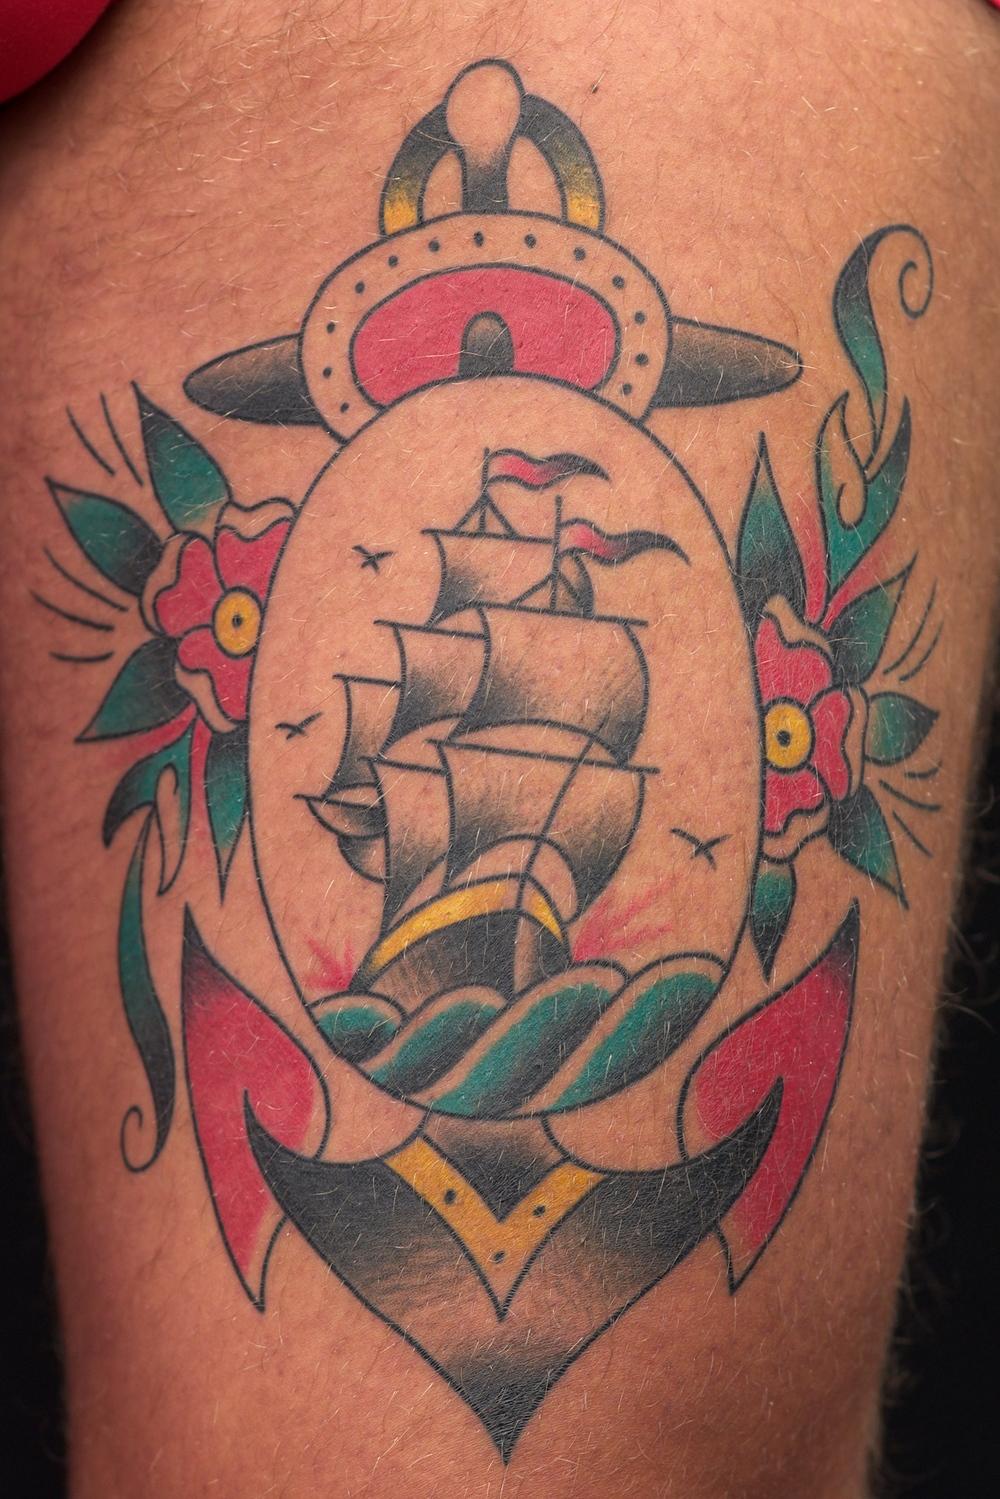 01062013 Tattoos 27 43.jpg